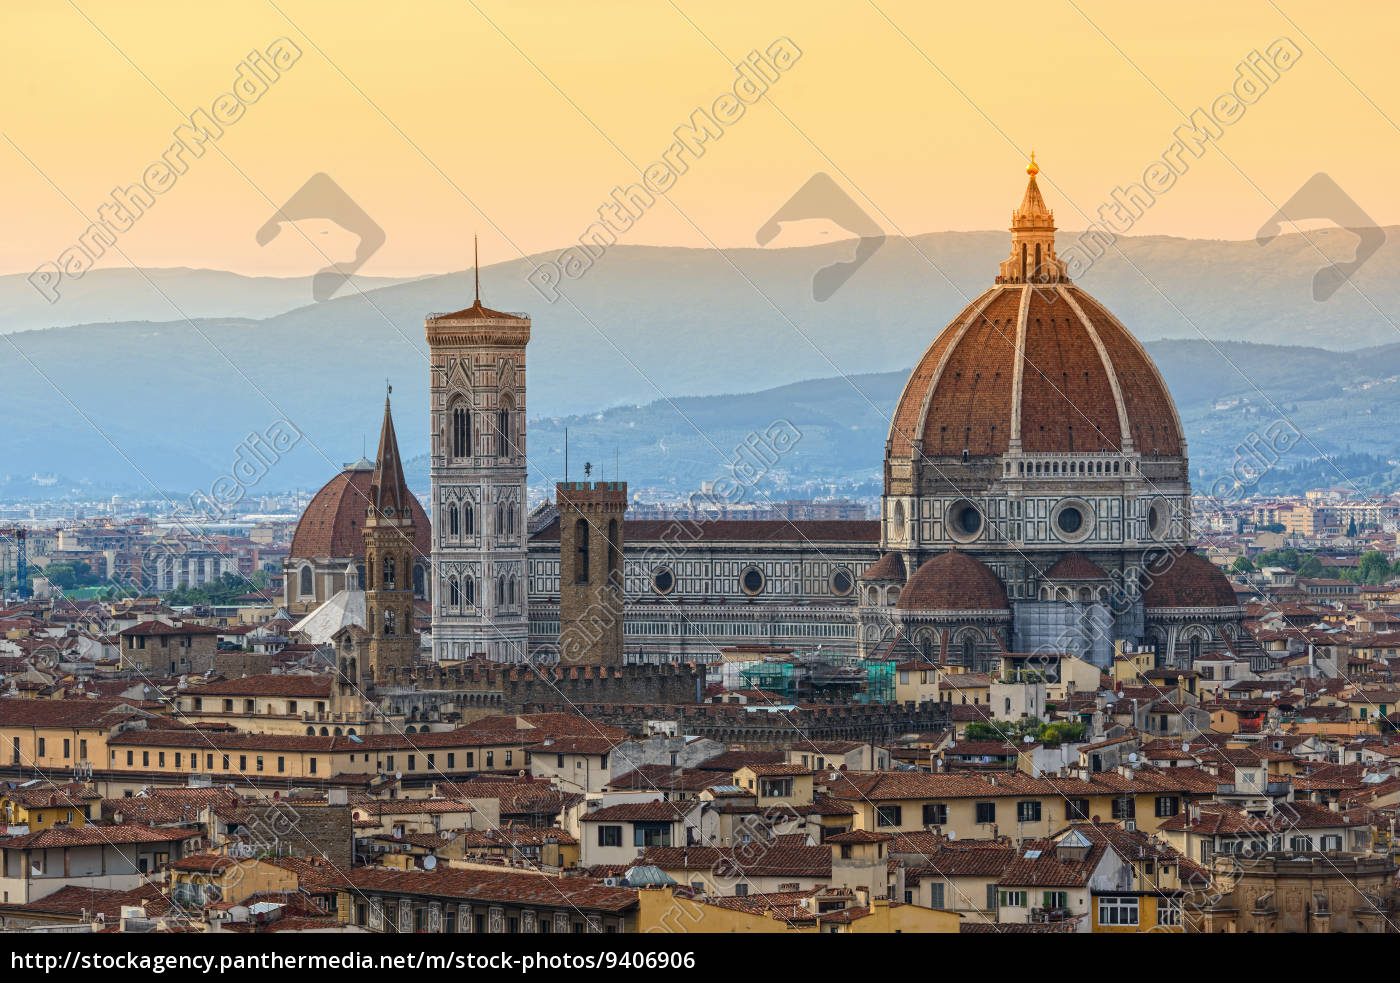 tuscany, classic - 9406906